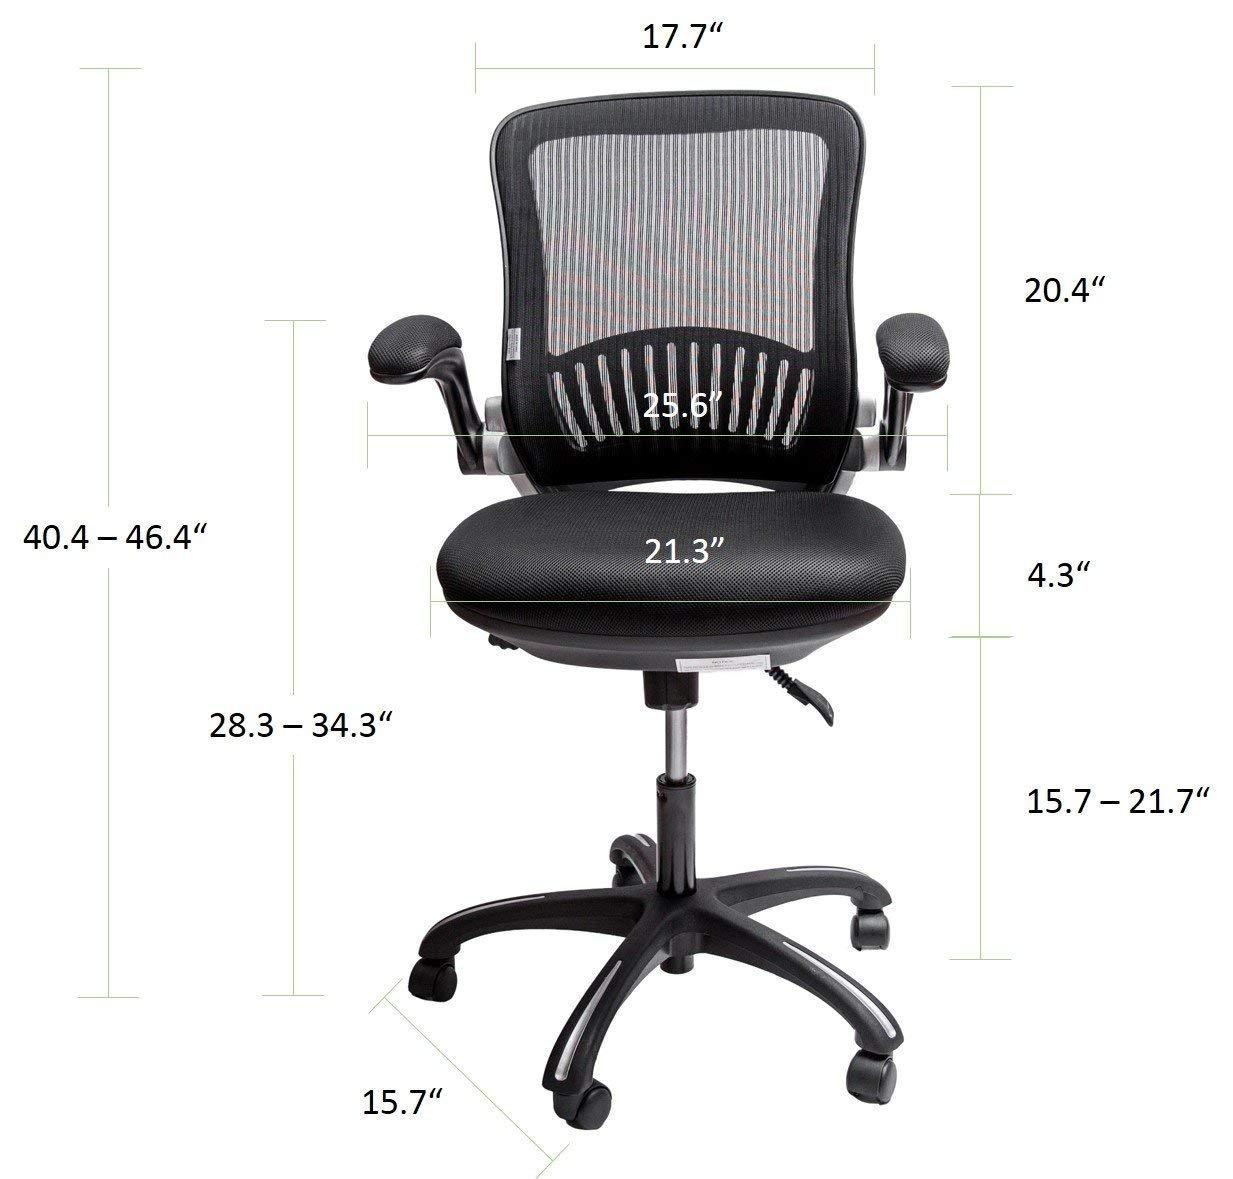 Amazon com: Sleekform Ergonomic Adjustable Office Desk Chair